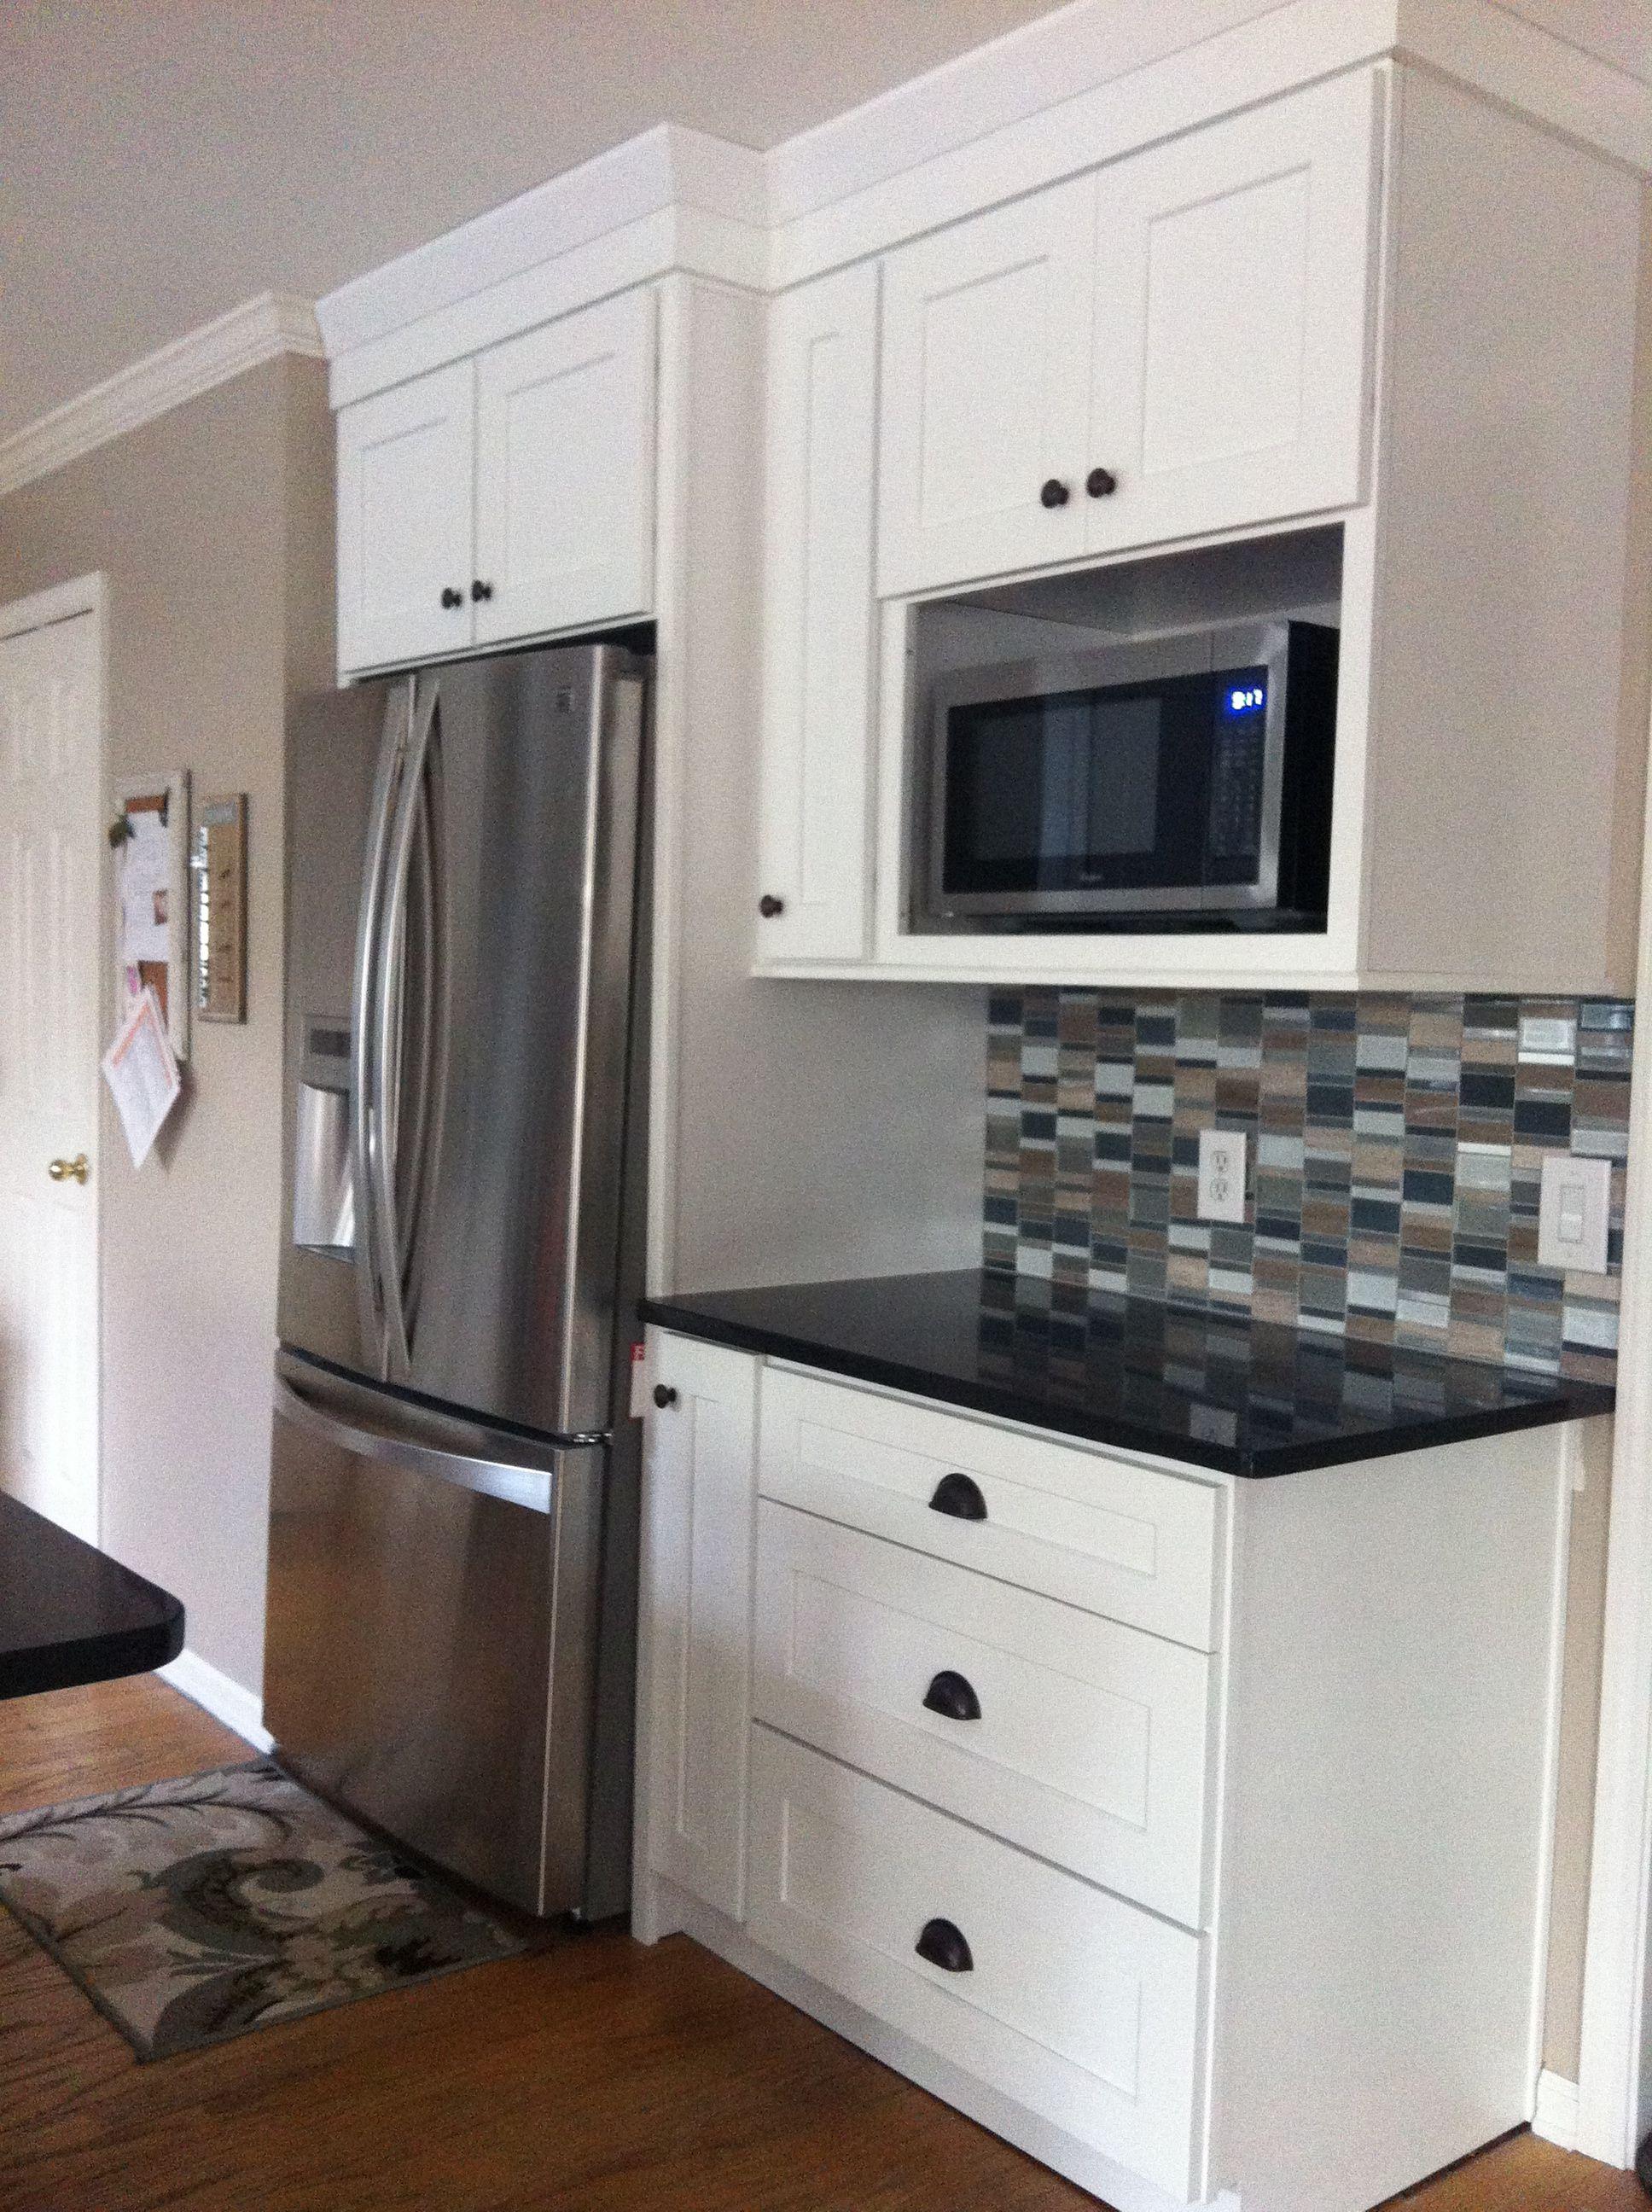 microwave shelf and fridge microwave